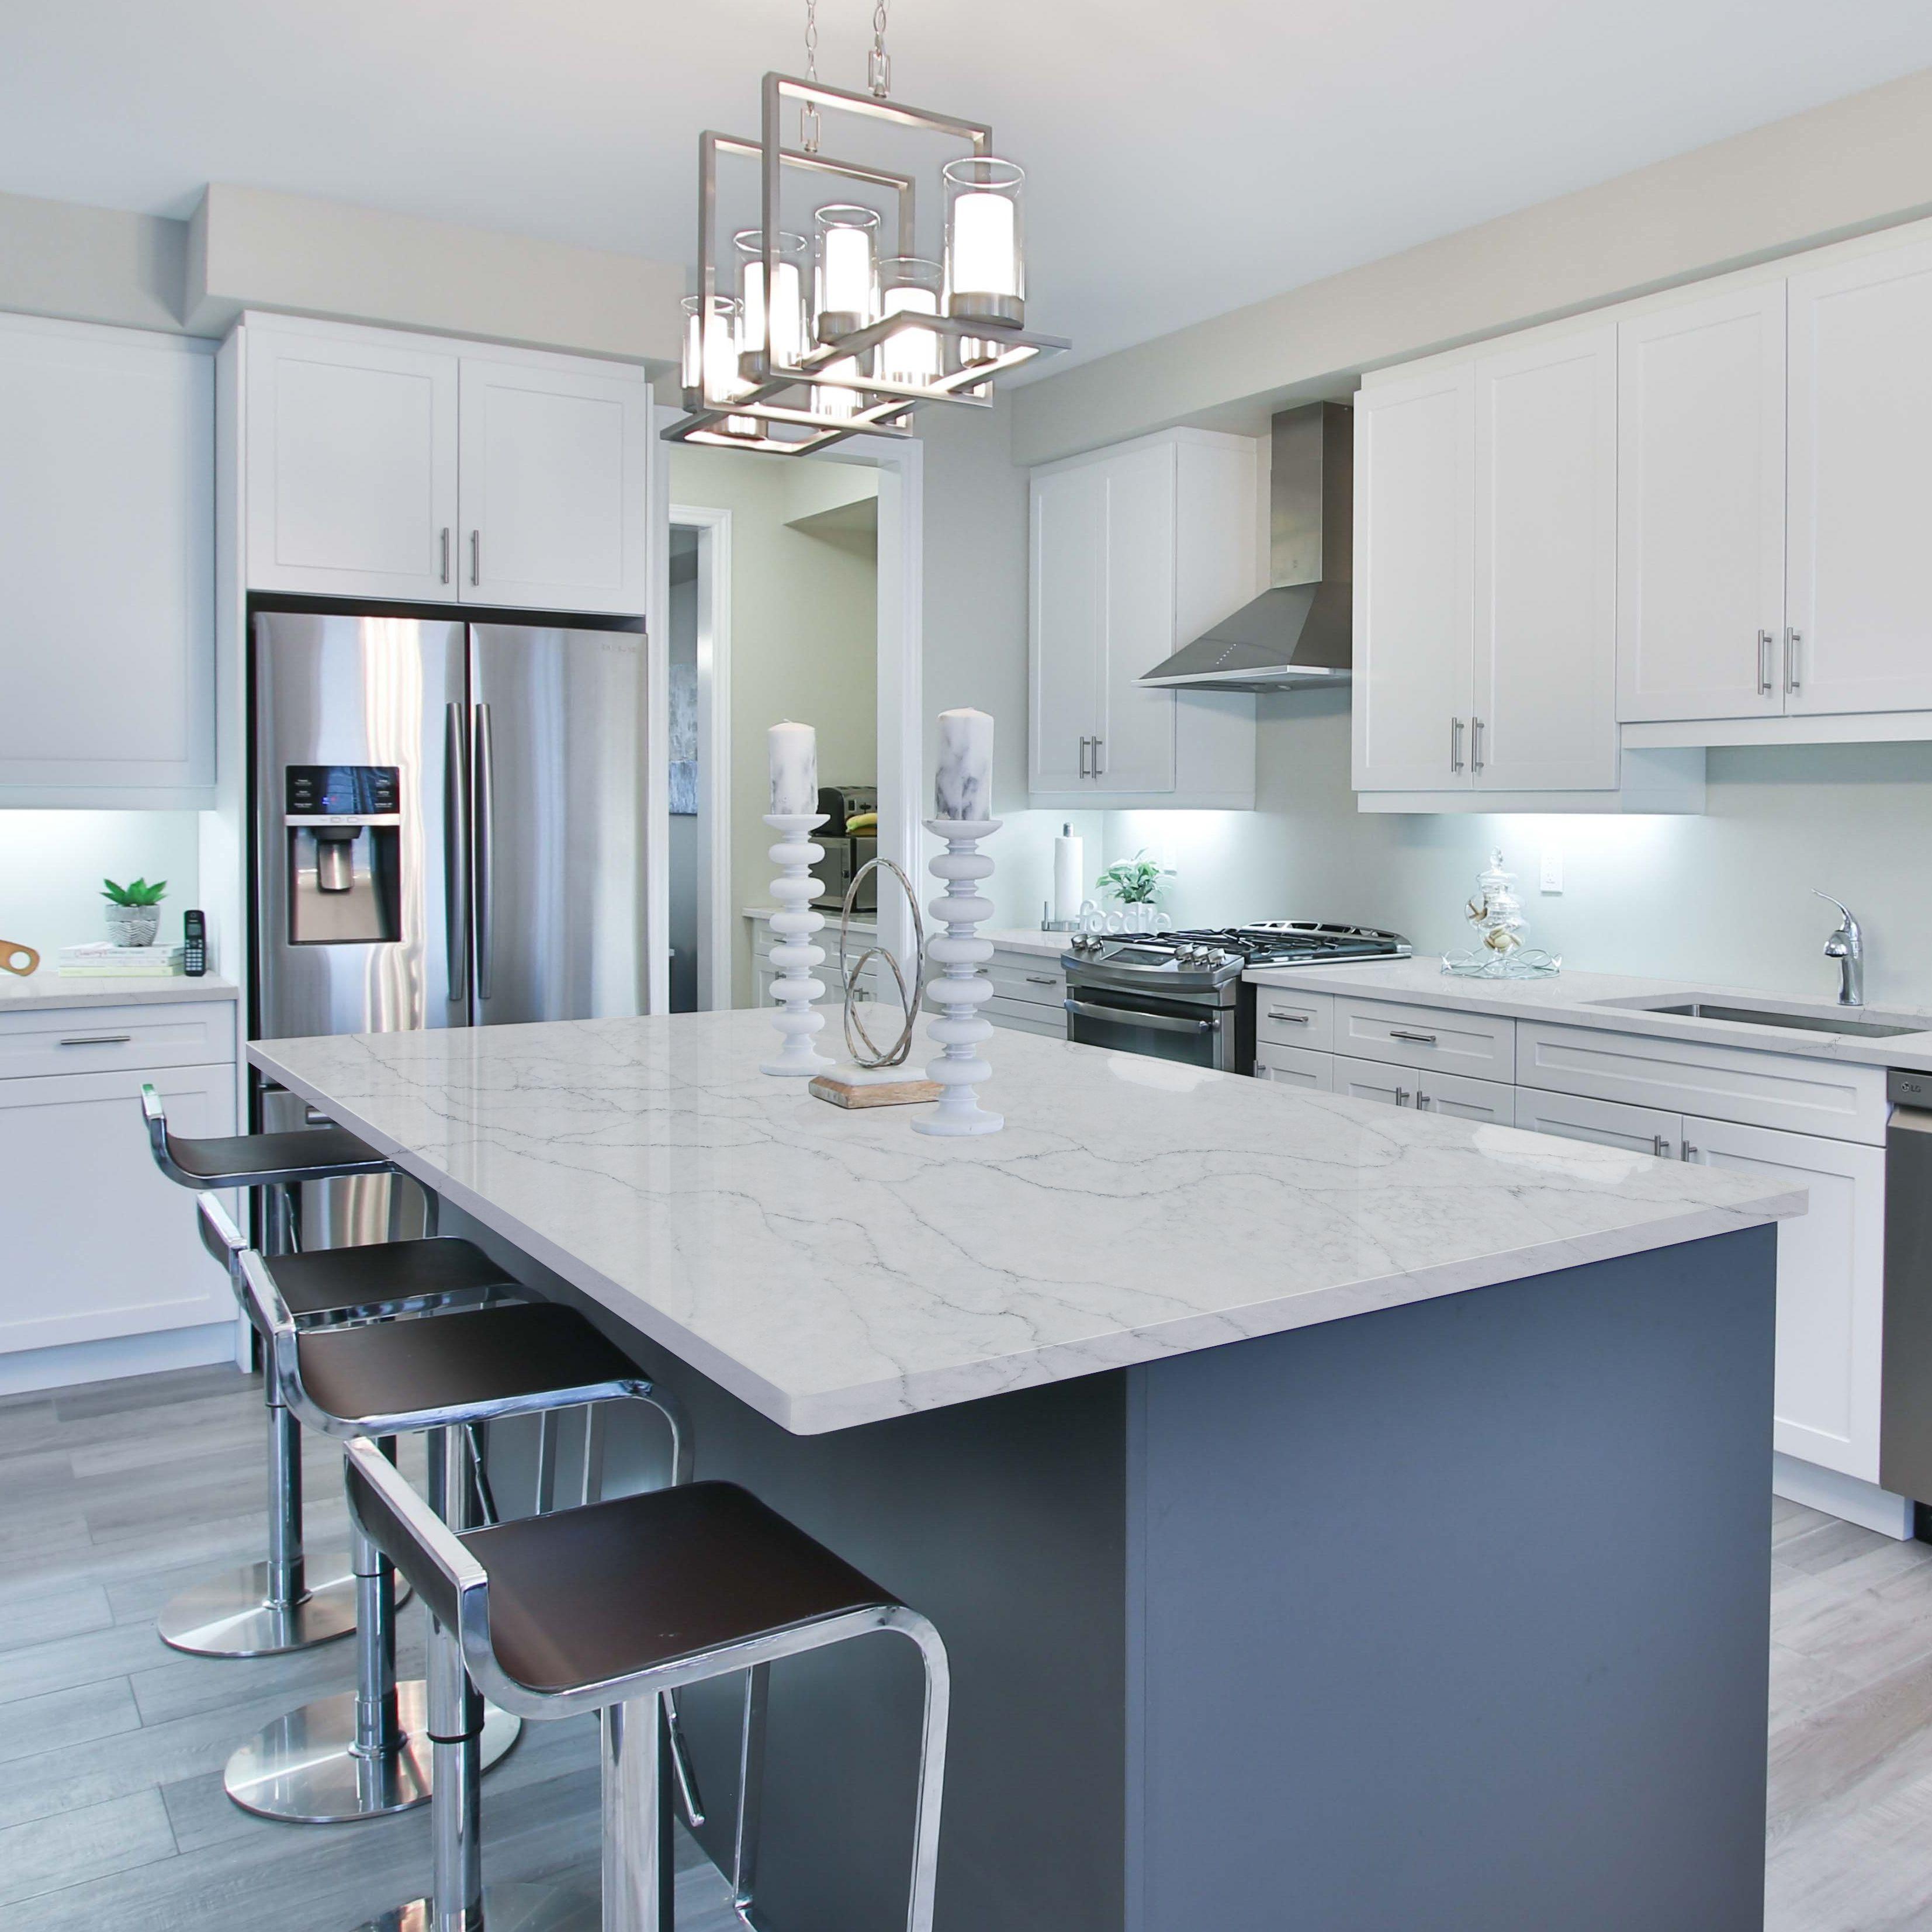 Sereno Bianco Quartz Island Countertop Kitchen Remodel